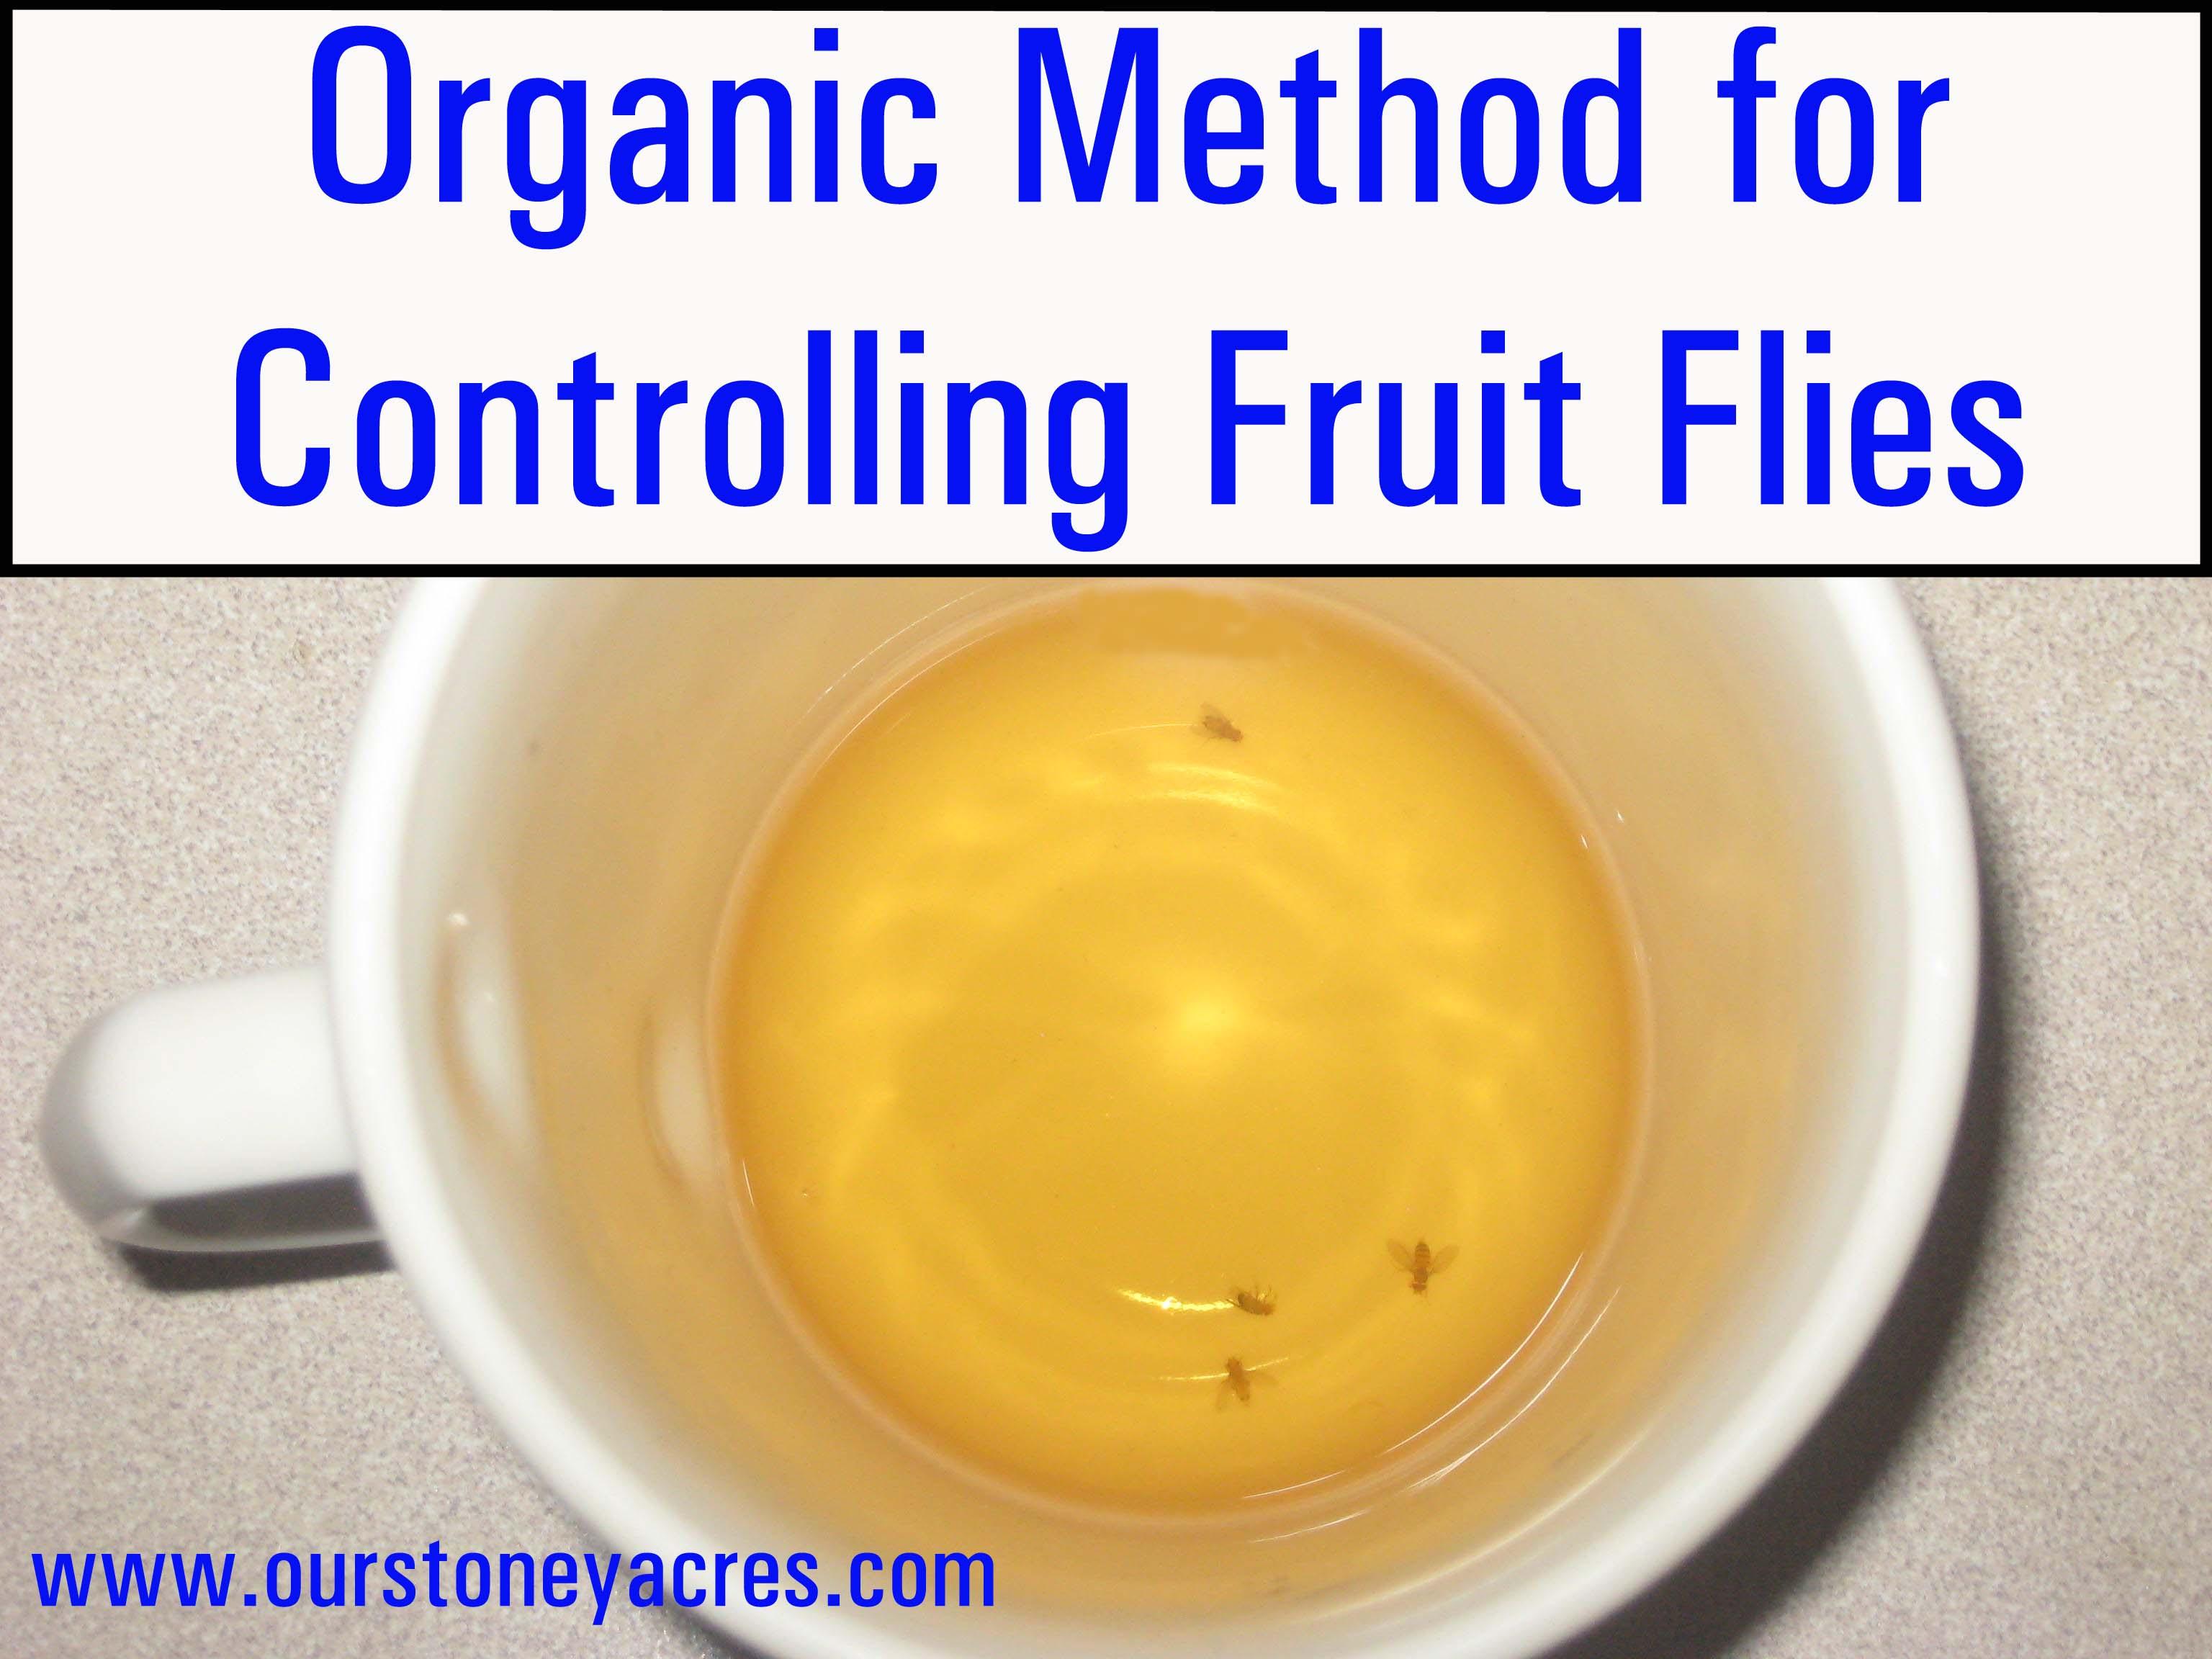 how long do fruit flies live healthy winter fruit salad